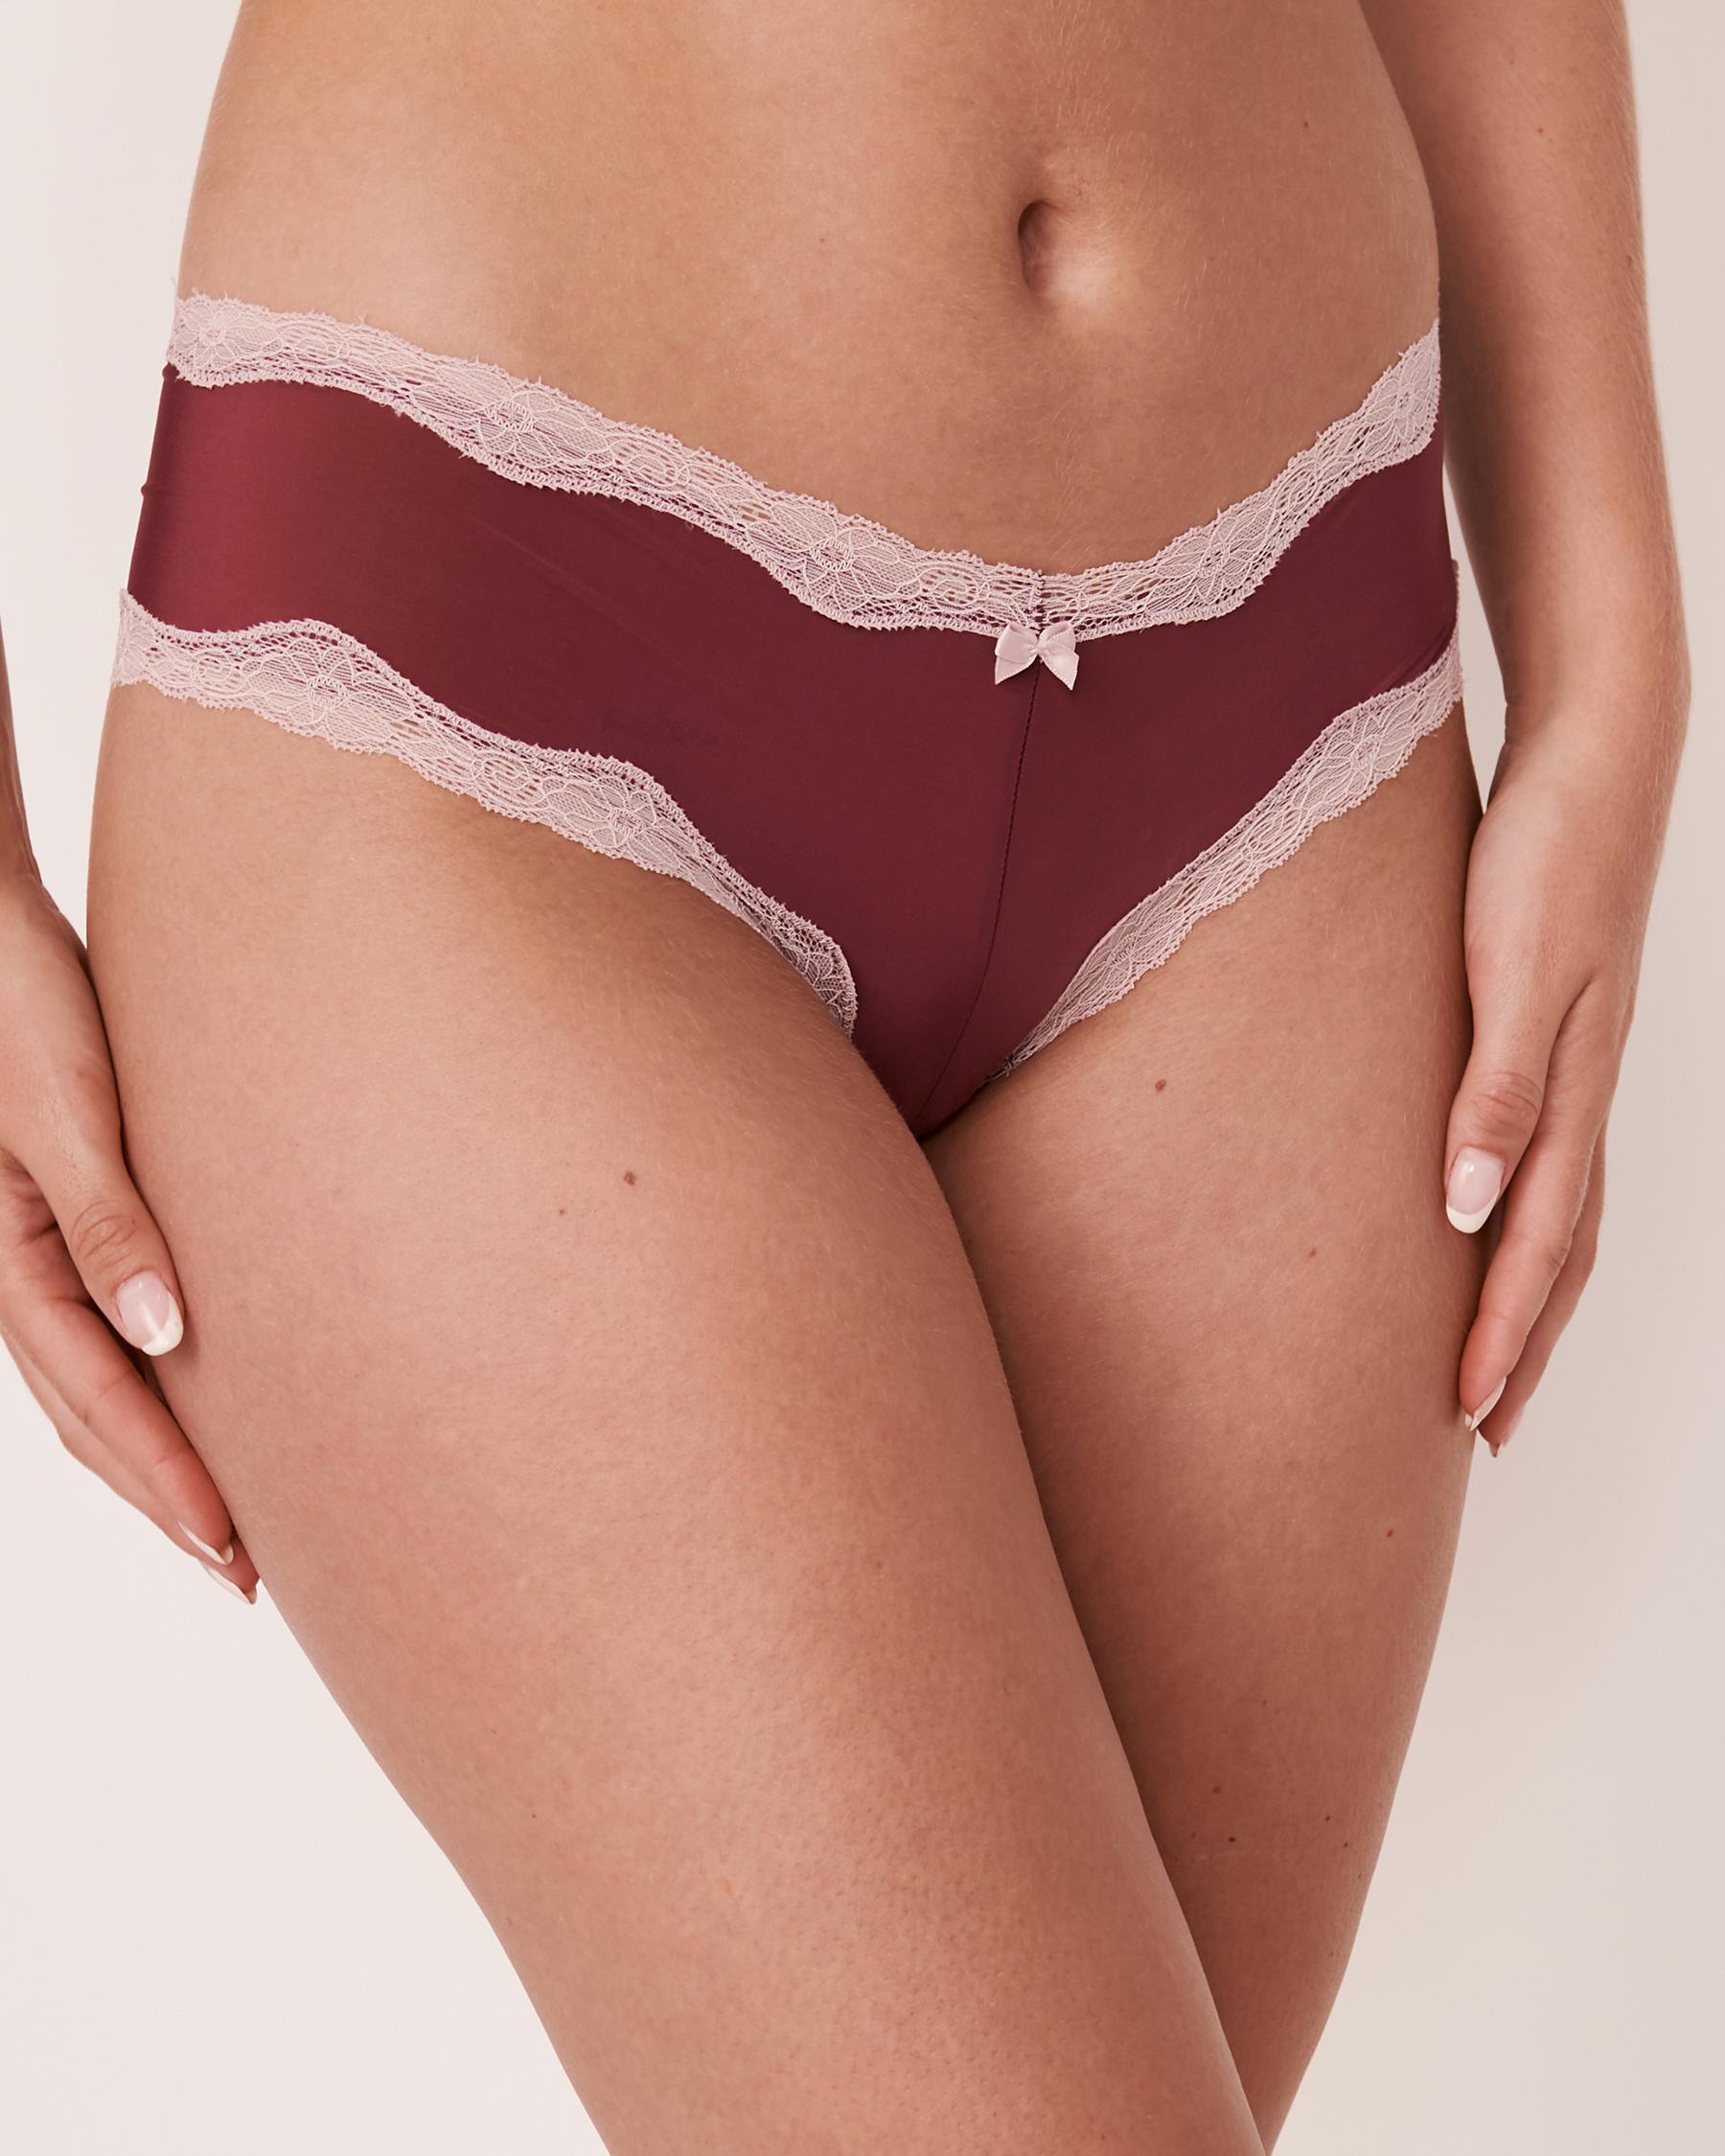 LA VIE EN ROSE Cheeky Panty Prune 20200075 - View1